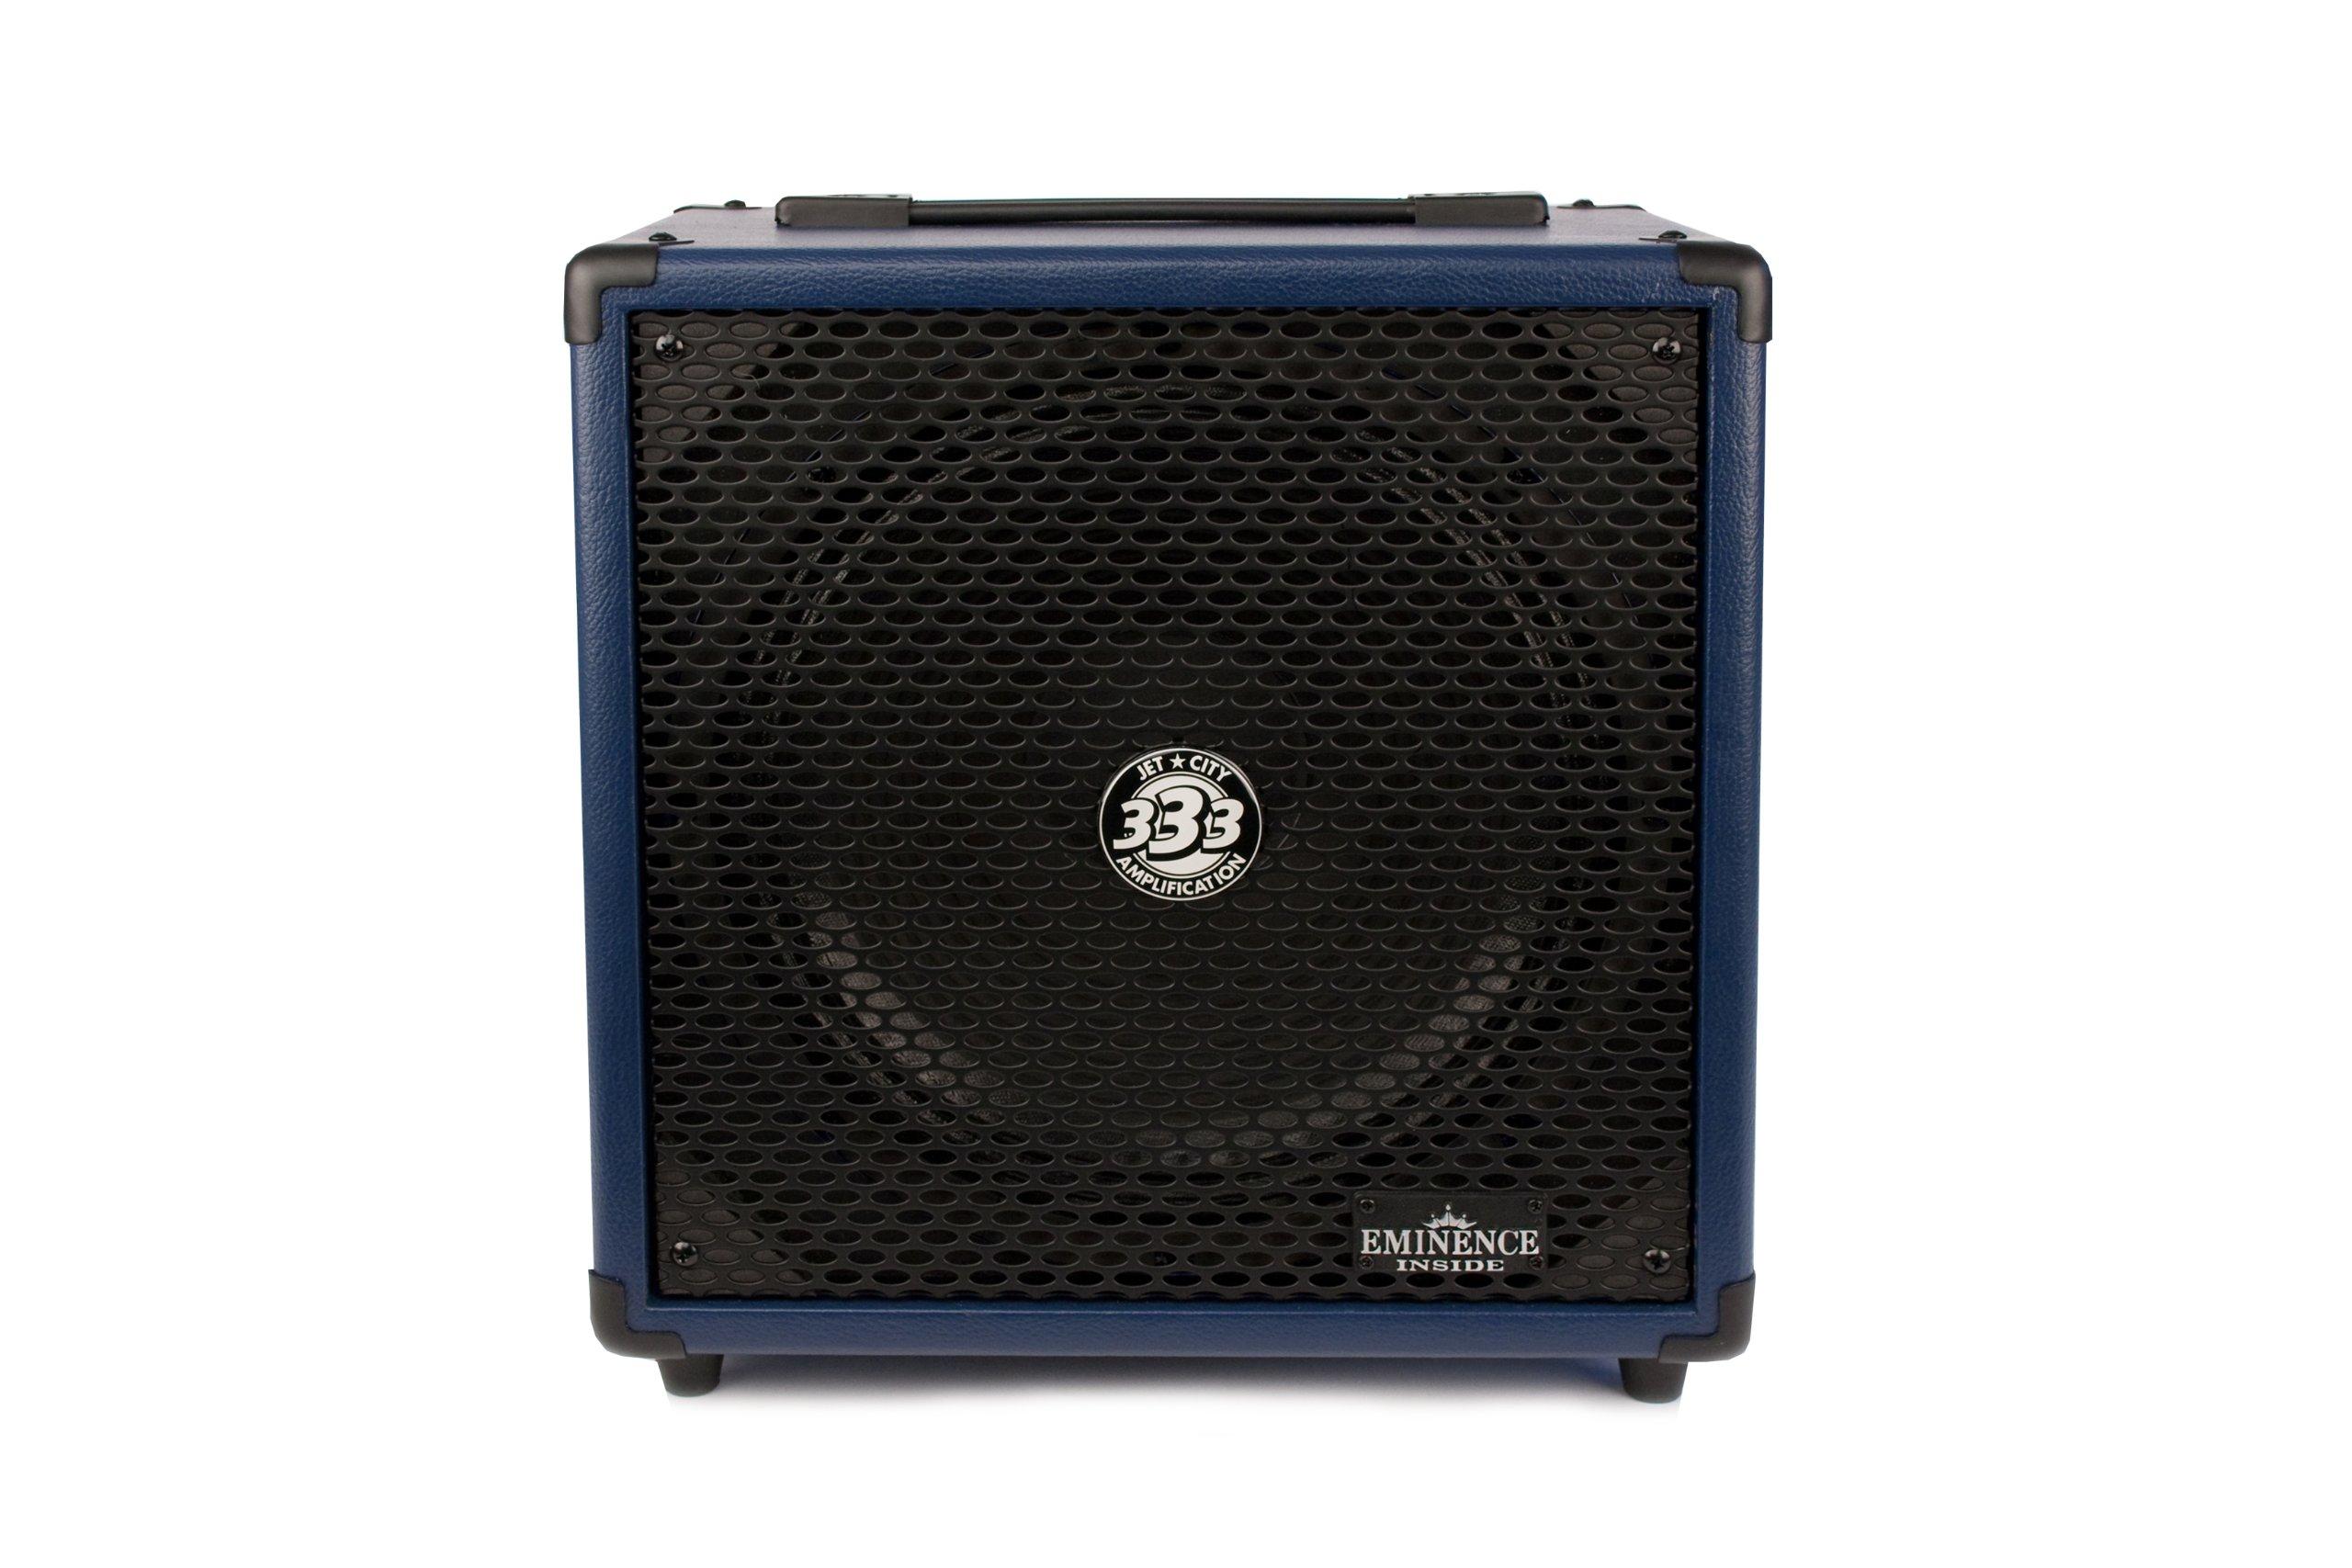 Jet City Amplification JCA12S 1x12-inch Guitar Speaker Cabinet